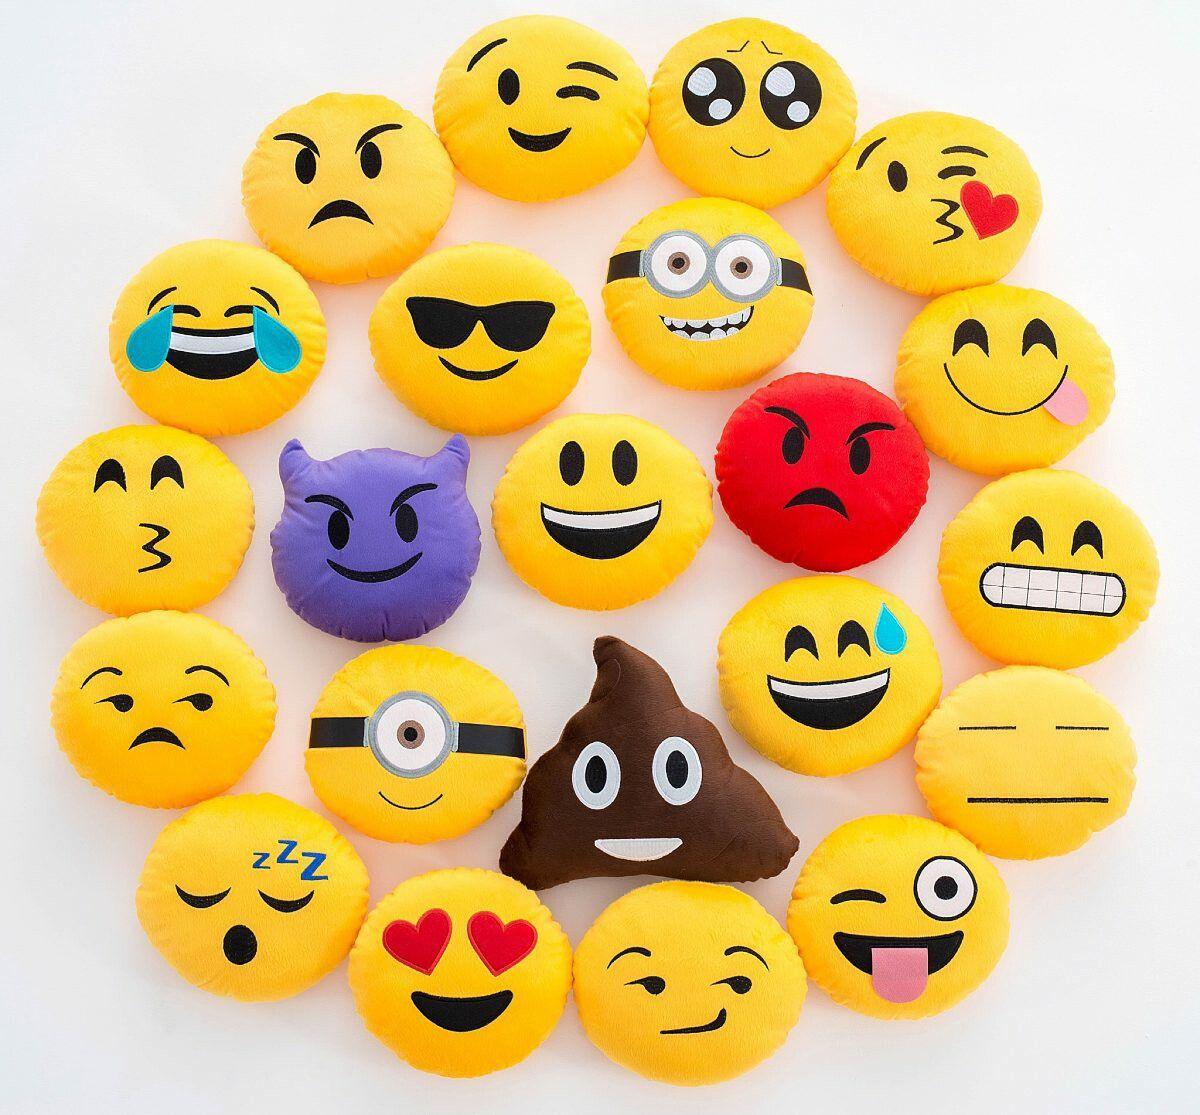 Son Emoticones Almofada Emoji Projetos Em Feltro Chaveiro De Feltro